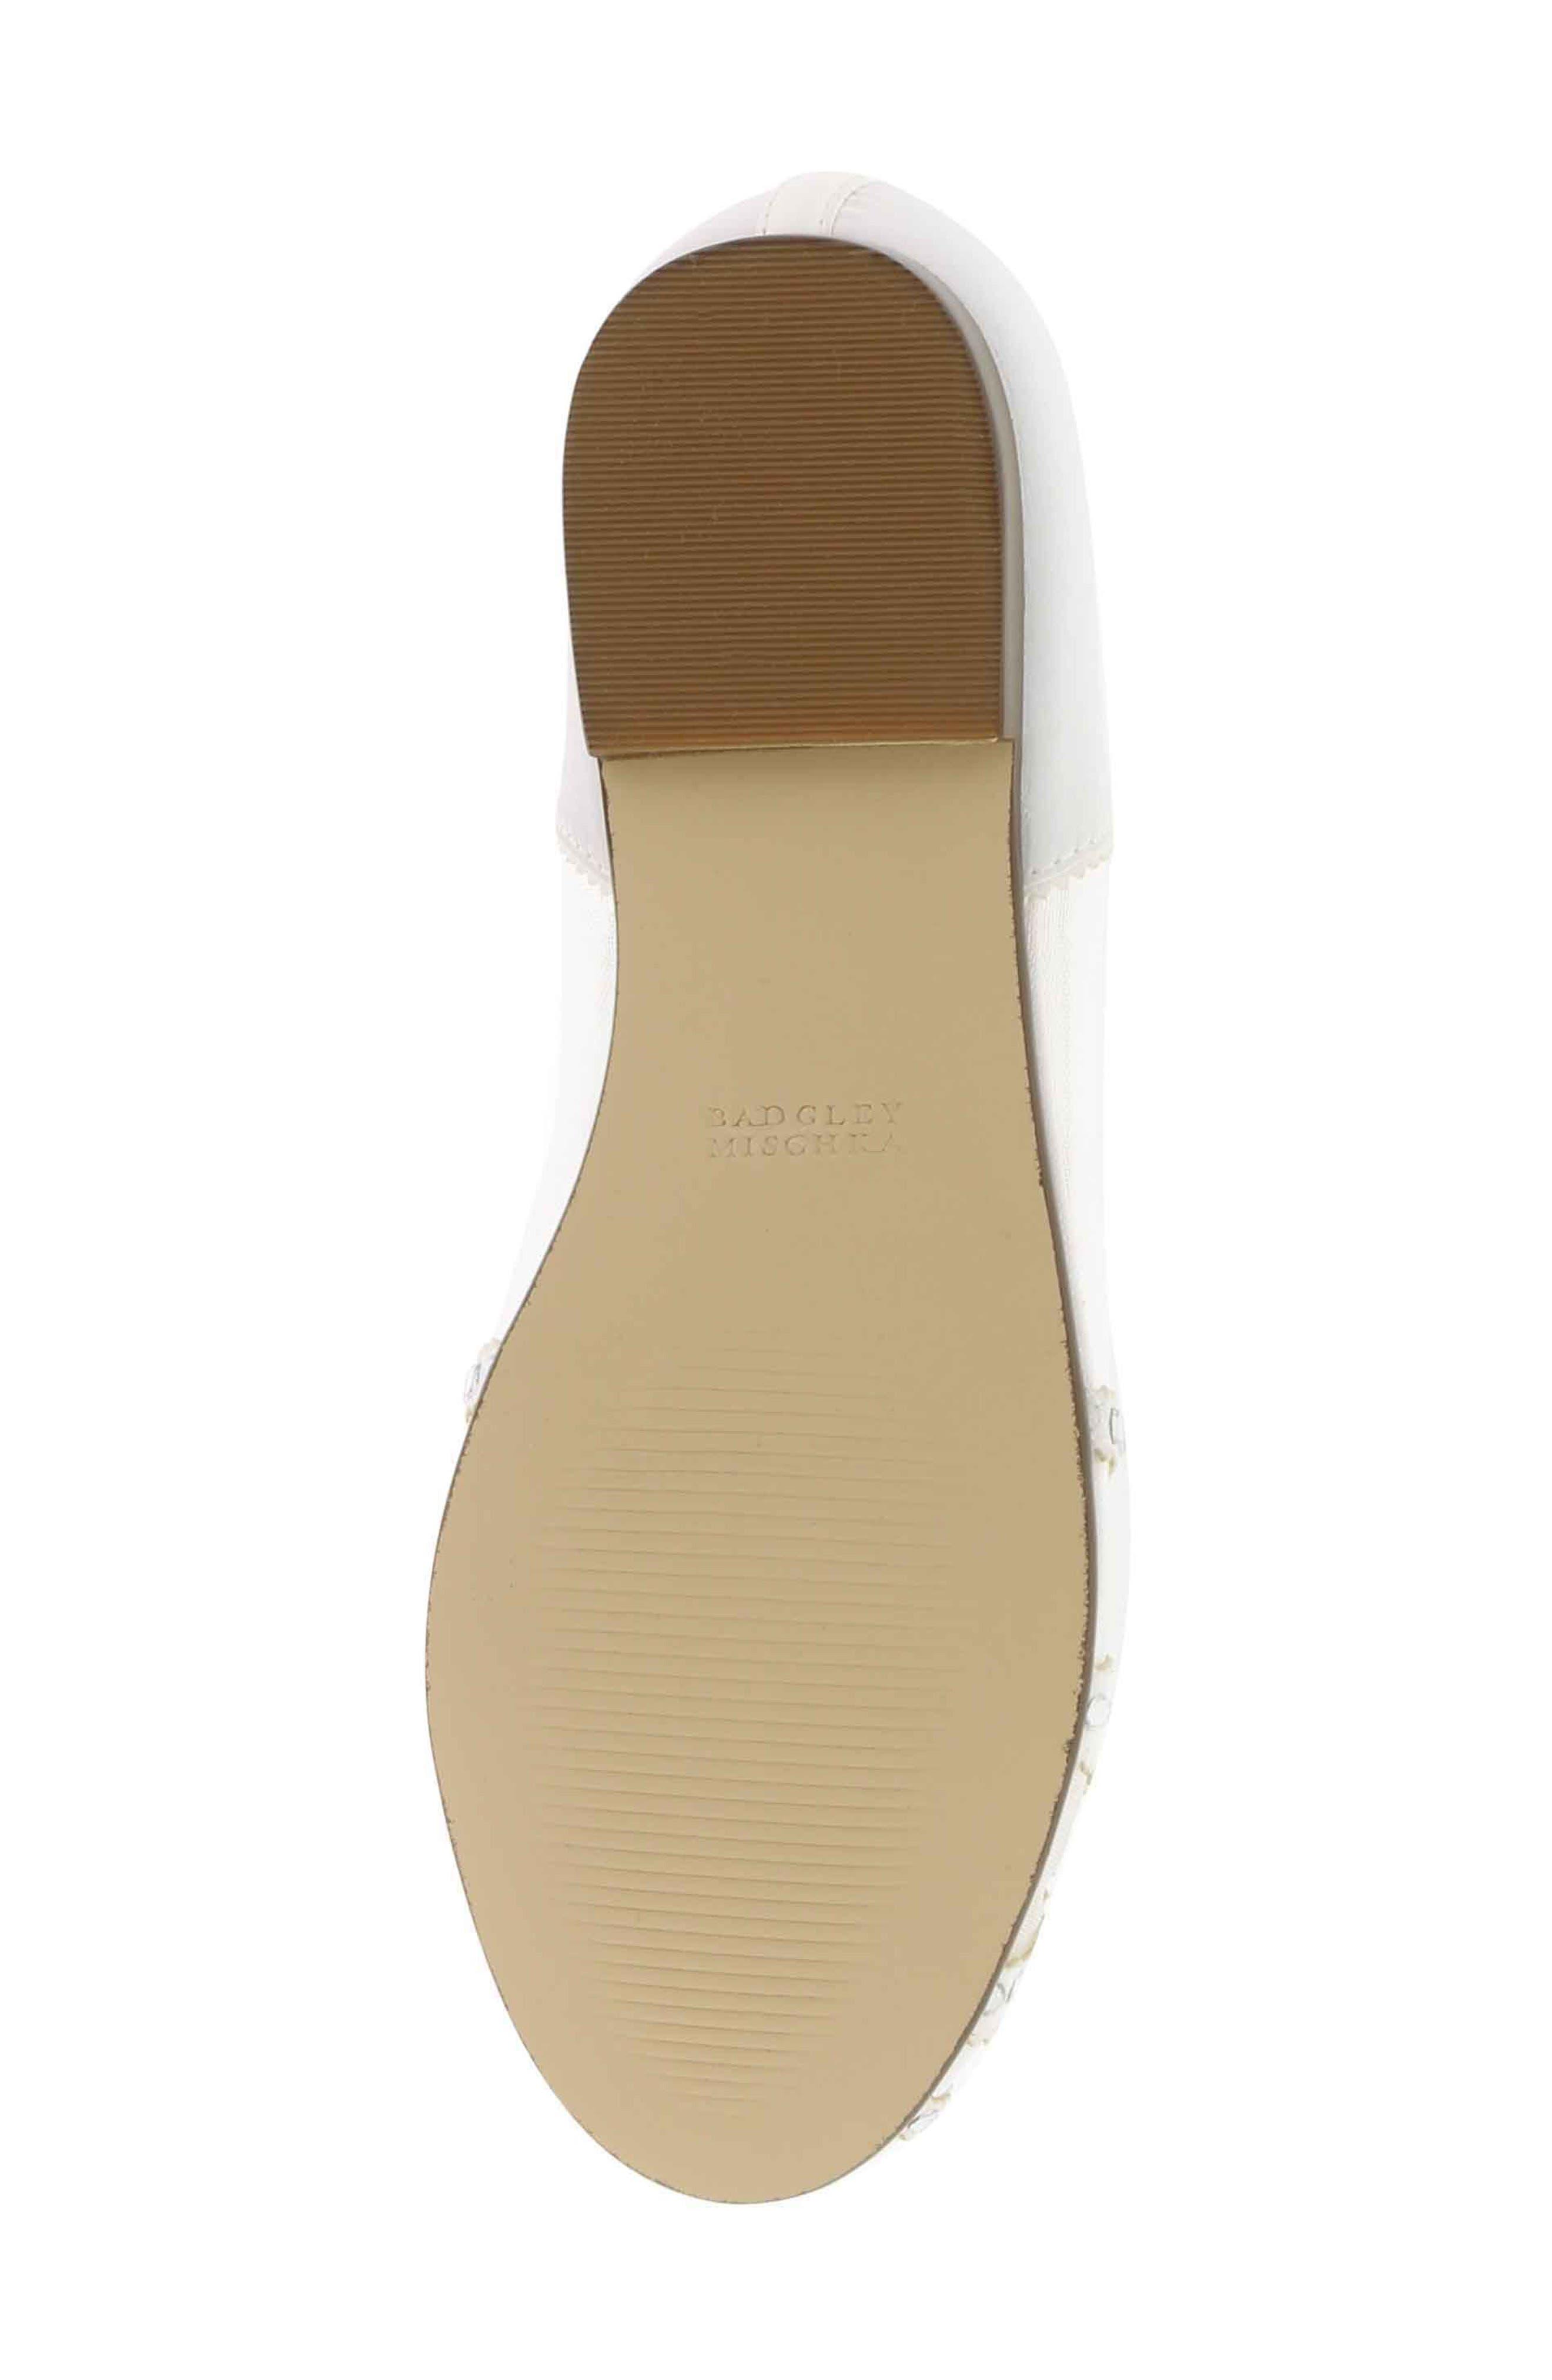 BADGLEY MISCHKA COLLECTION, Badgley Mischka Gigi Embellished Flat, Alternate thumbnail 4, color, WHITE